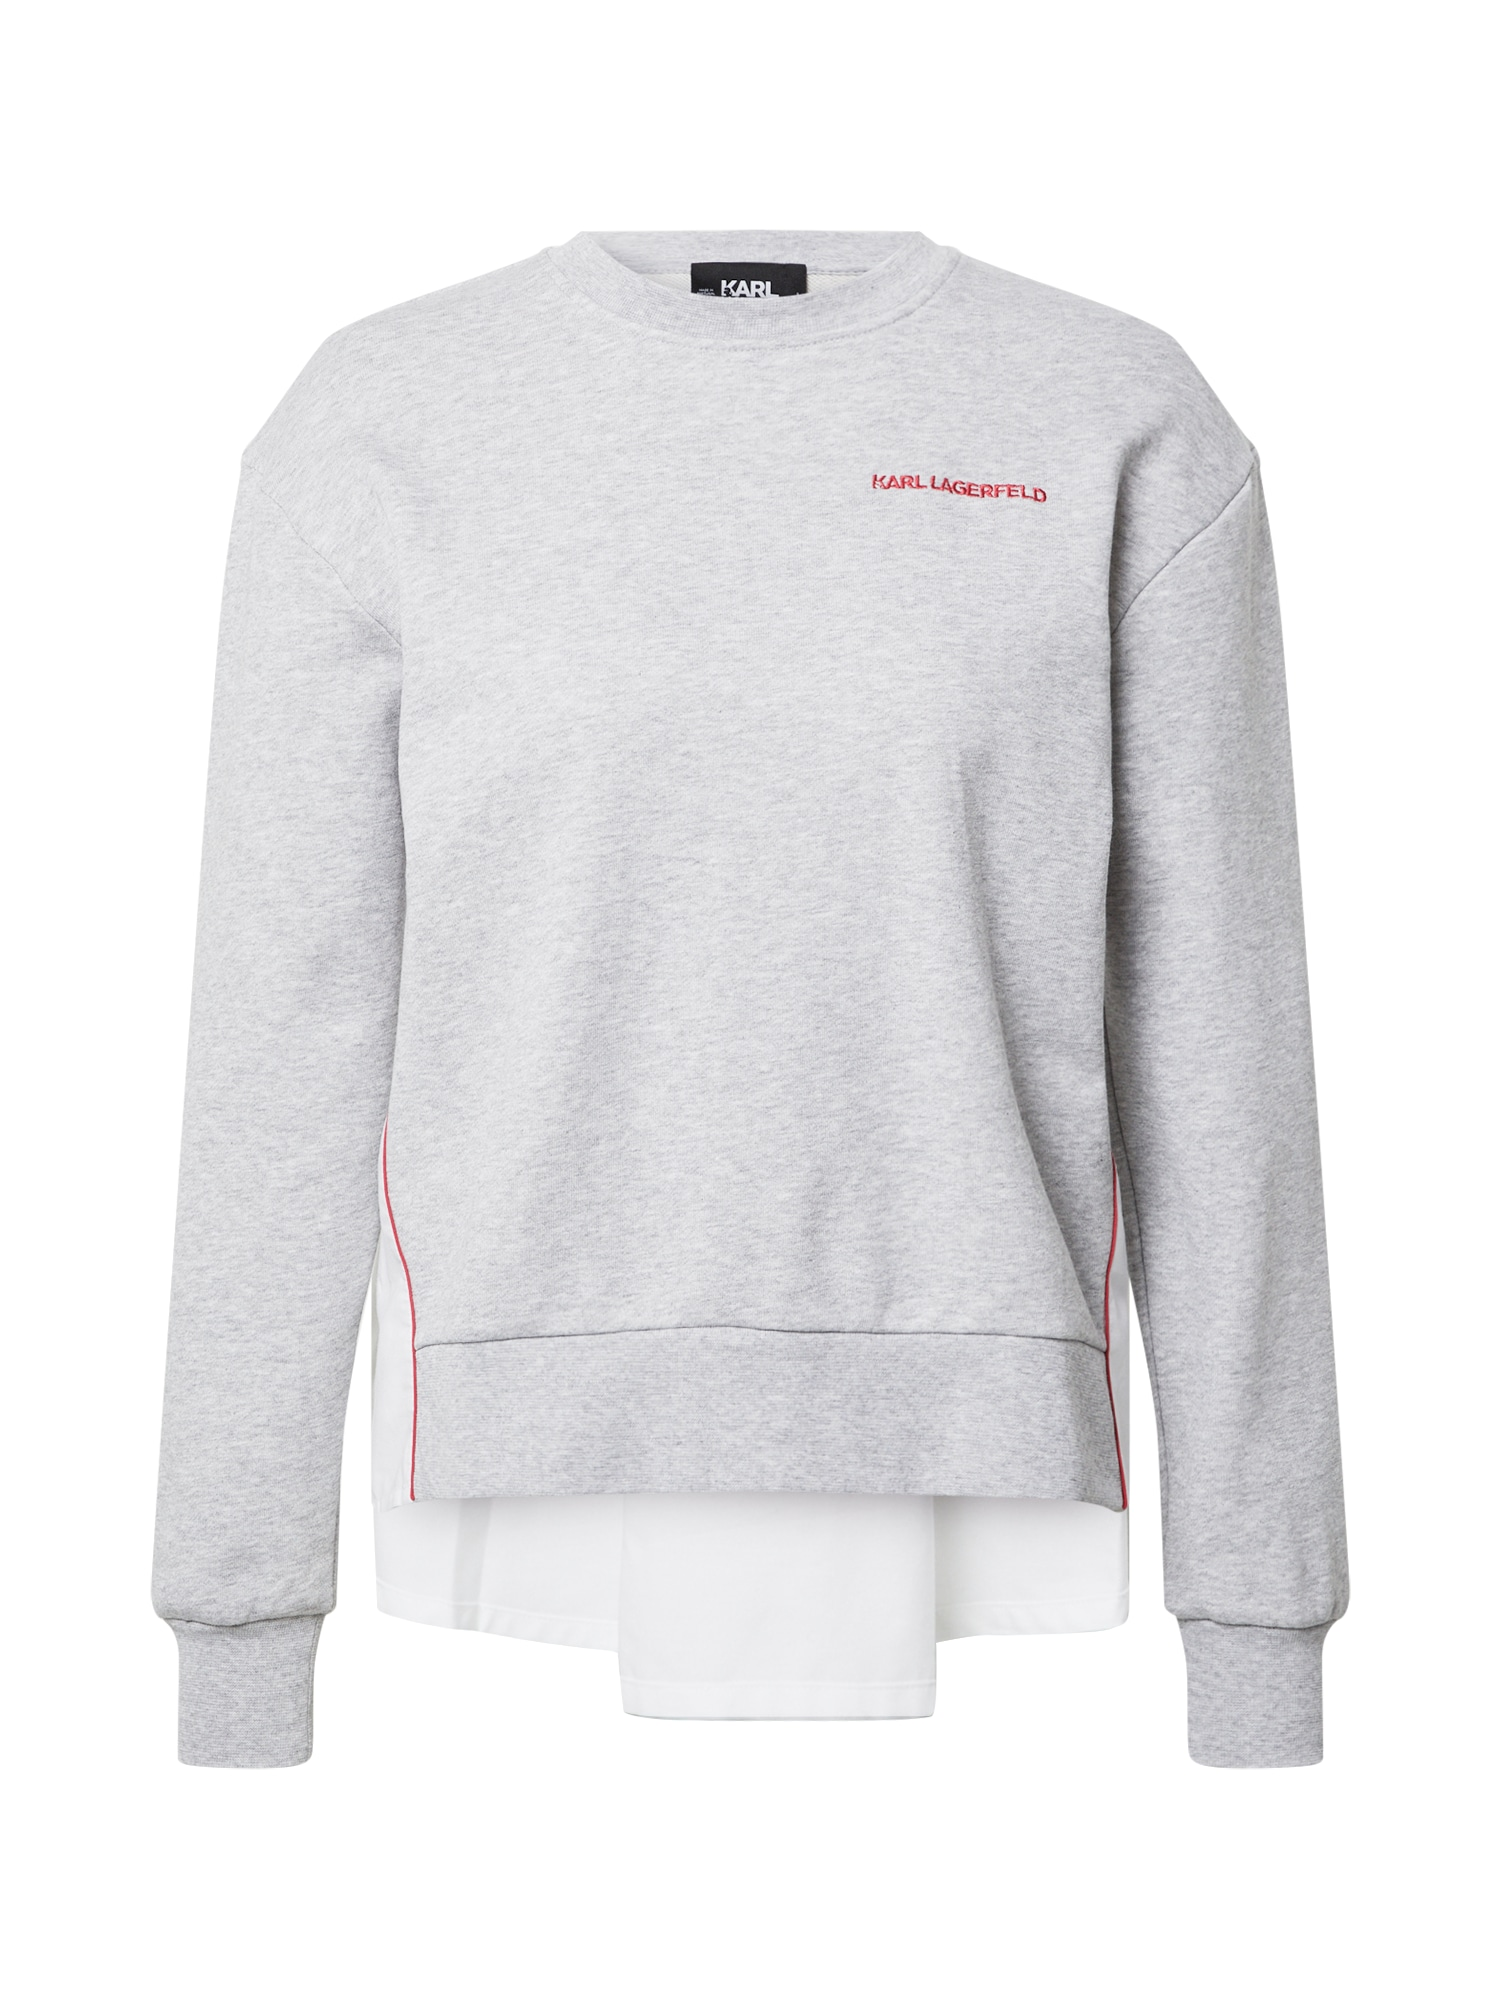 Karl Lagerfeld Megztinis be užsegimo margai pilka / balta / raudona